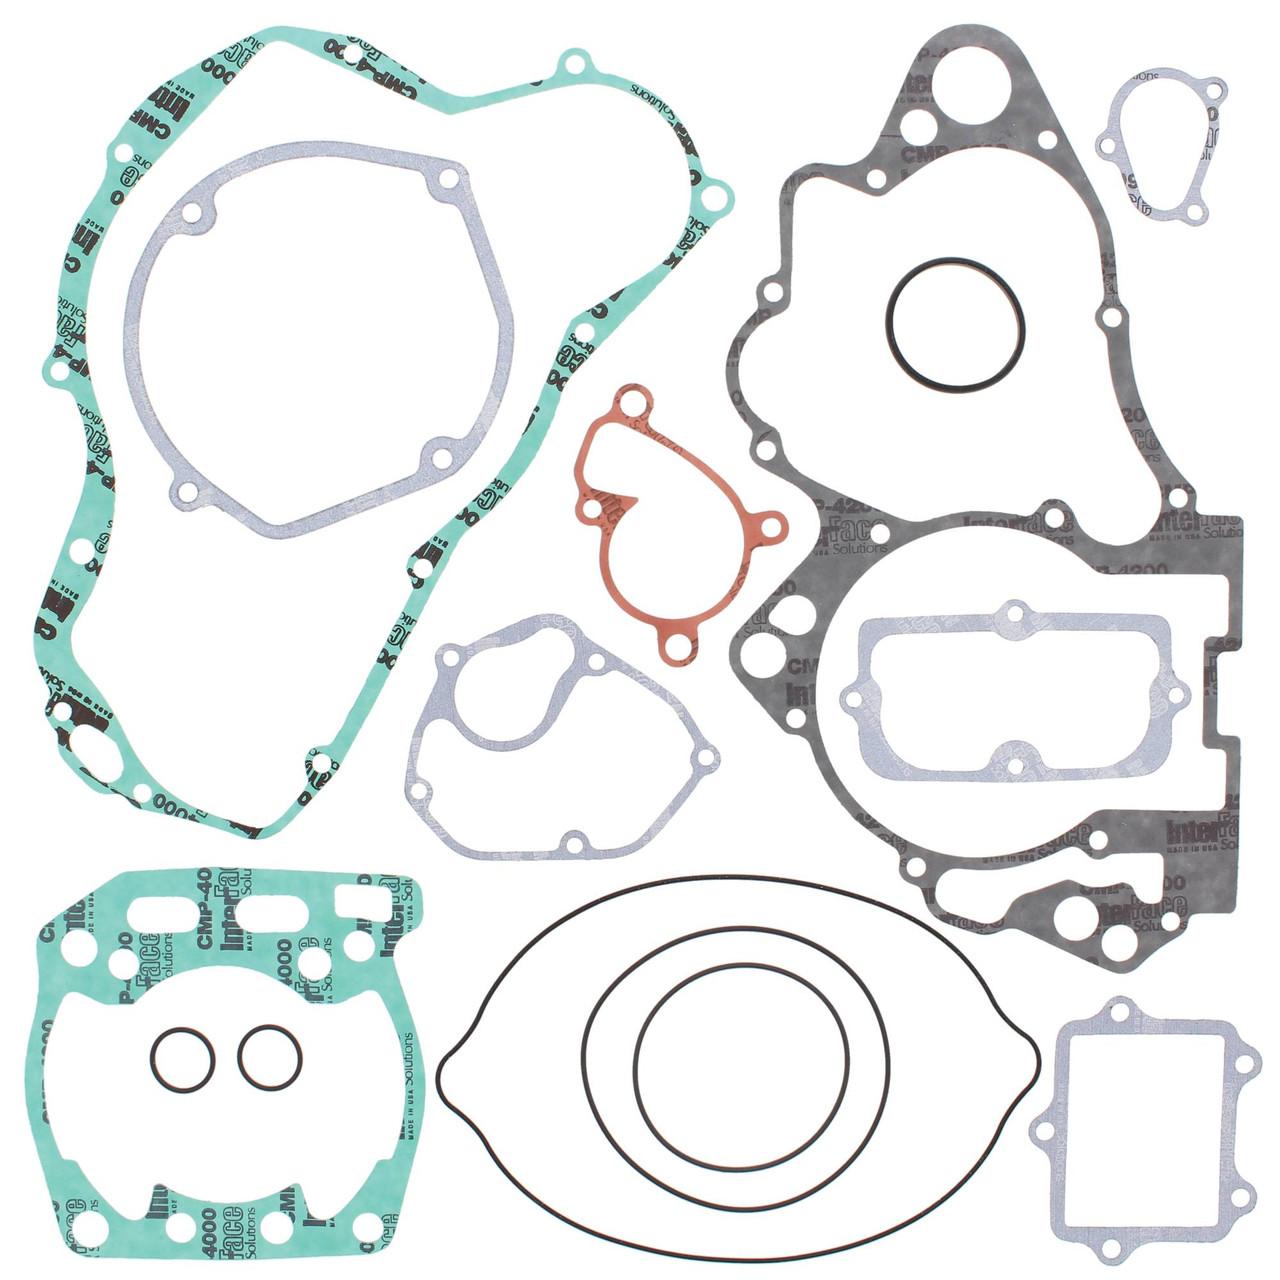 Winderosa Complete Gasket Kit for Suzuki RM 250 06 07 08